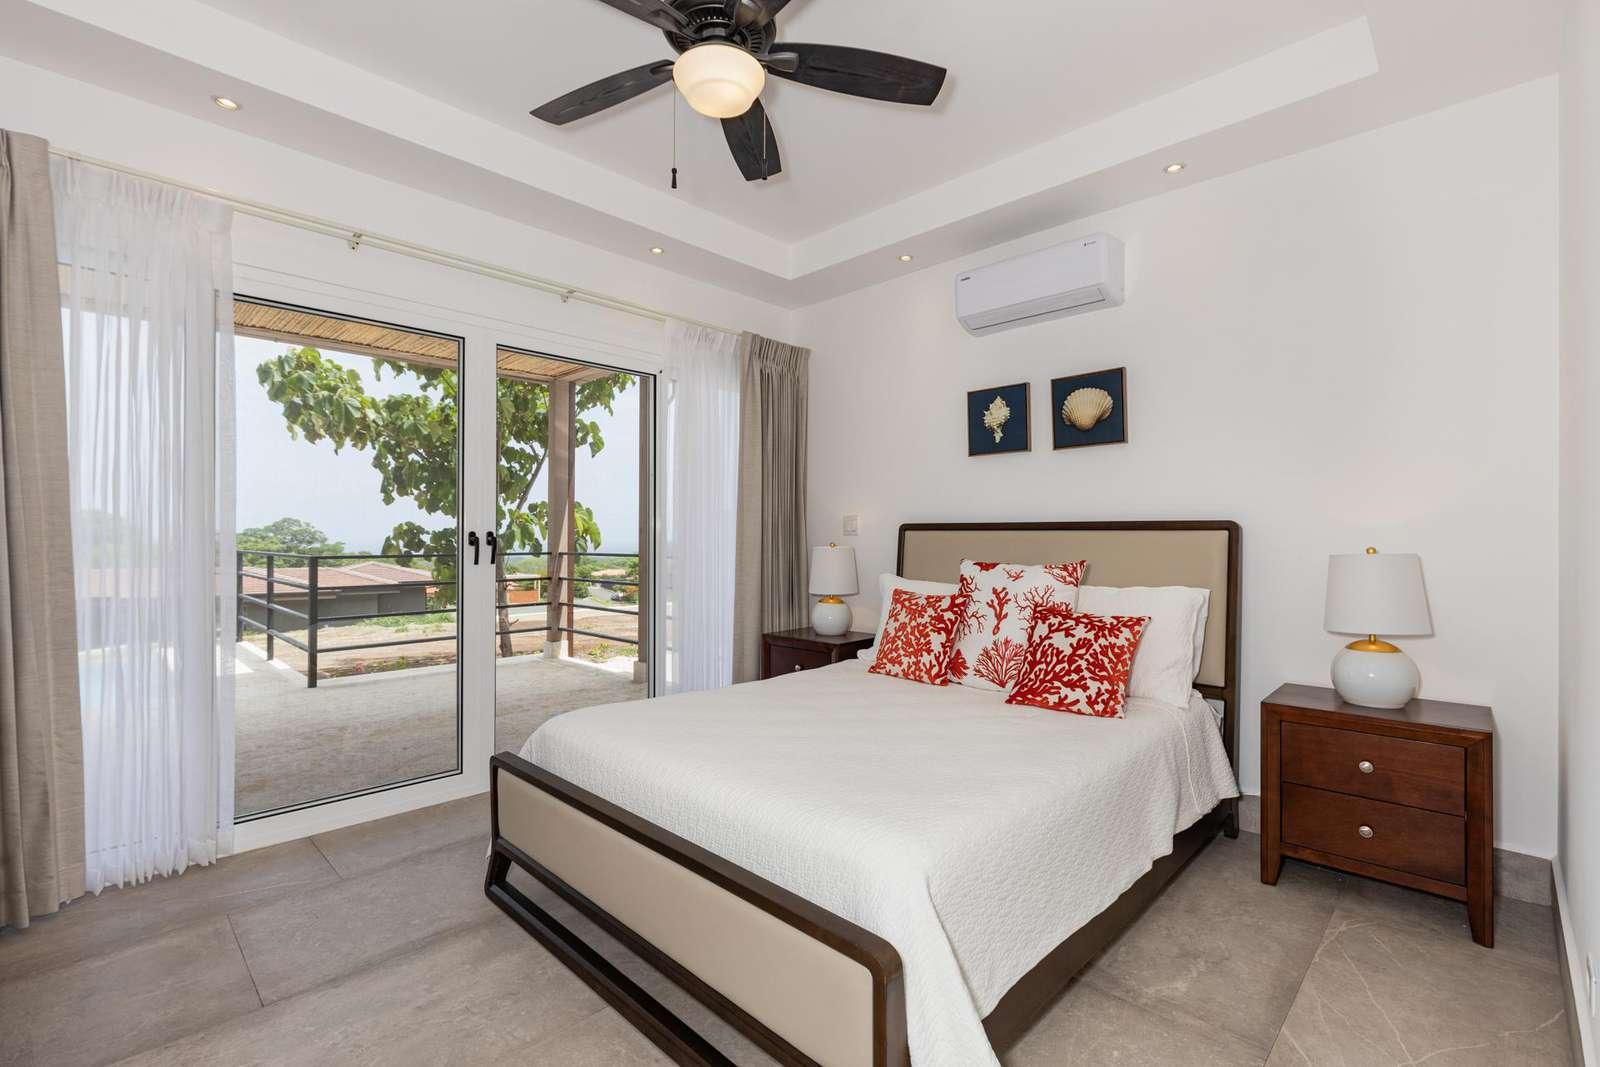 Master bedroom, Queen bed, private bathroom